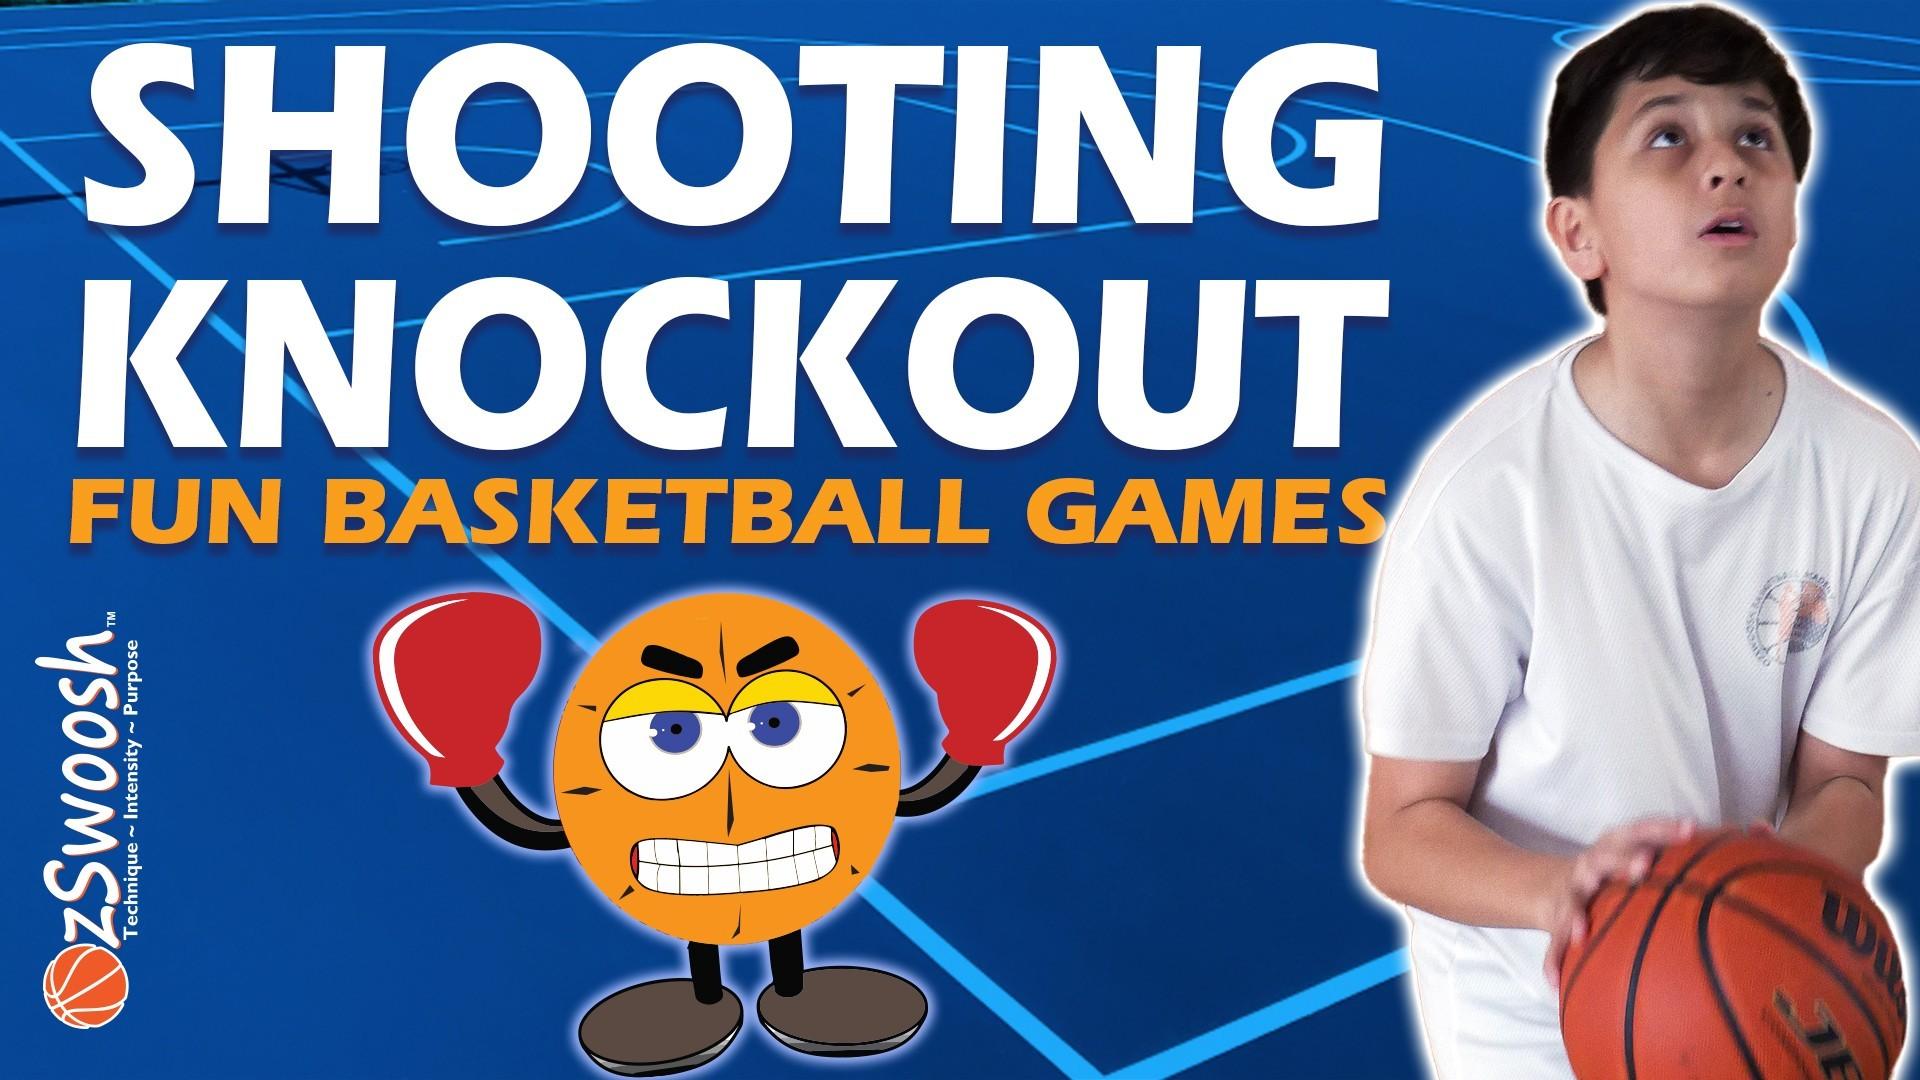 Fun Youth Basketball Drills For Kids - Shooting Knockout (Shooting Game)